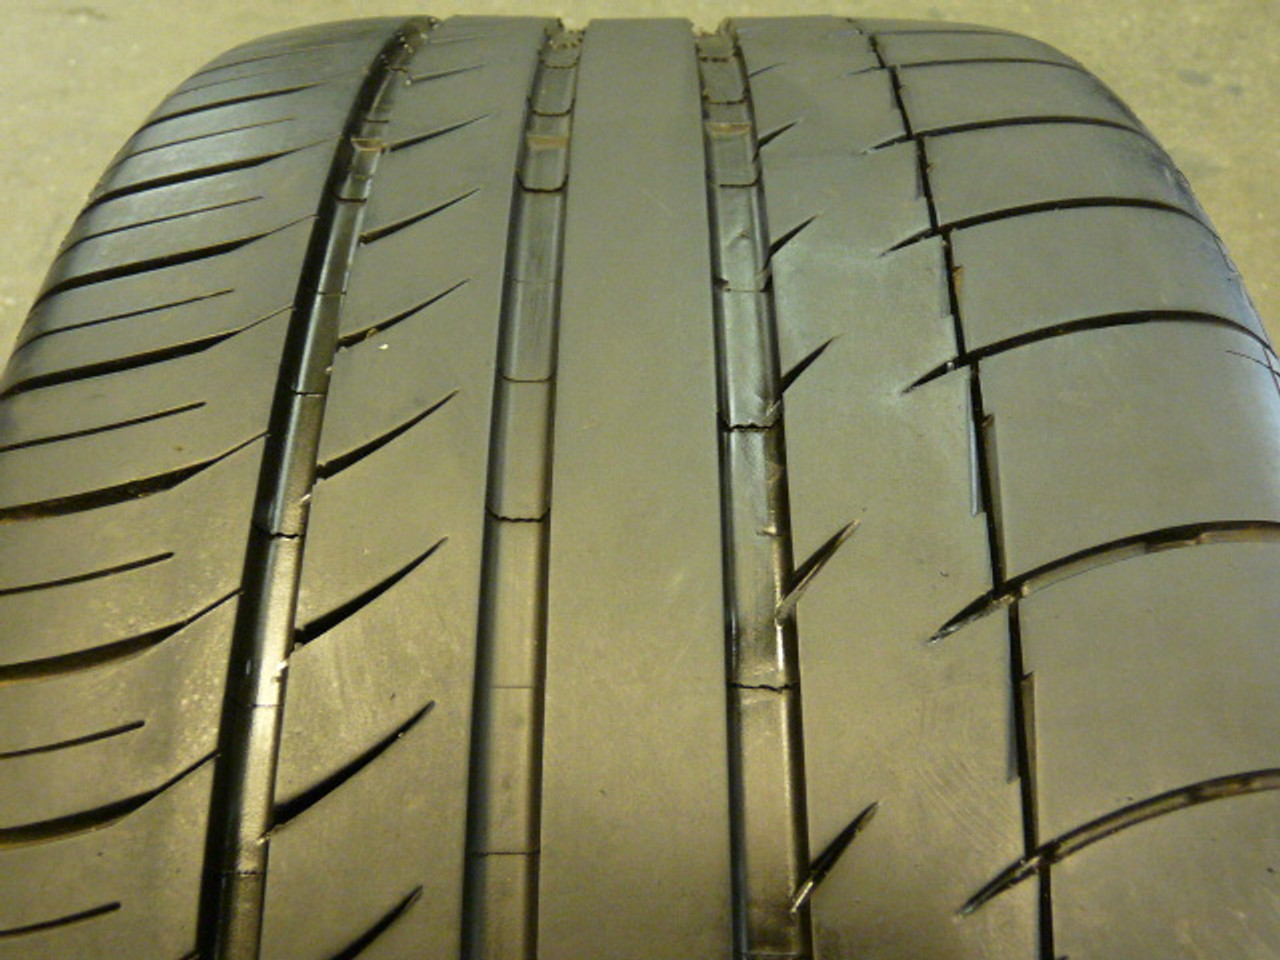 Used Take Off 235 45 17 Michelin Tire P235/45R17